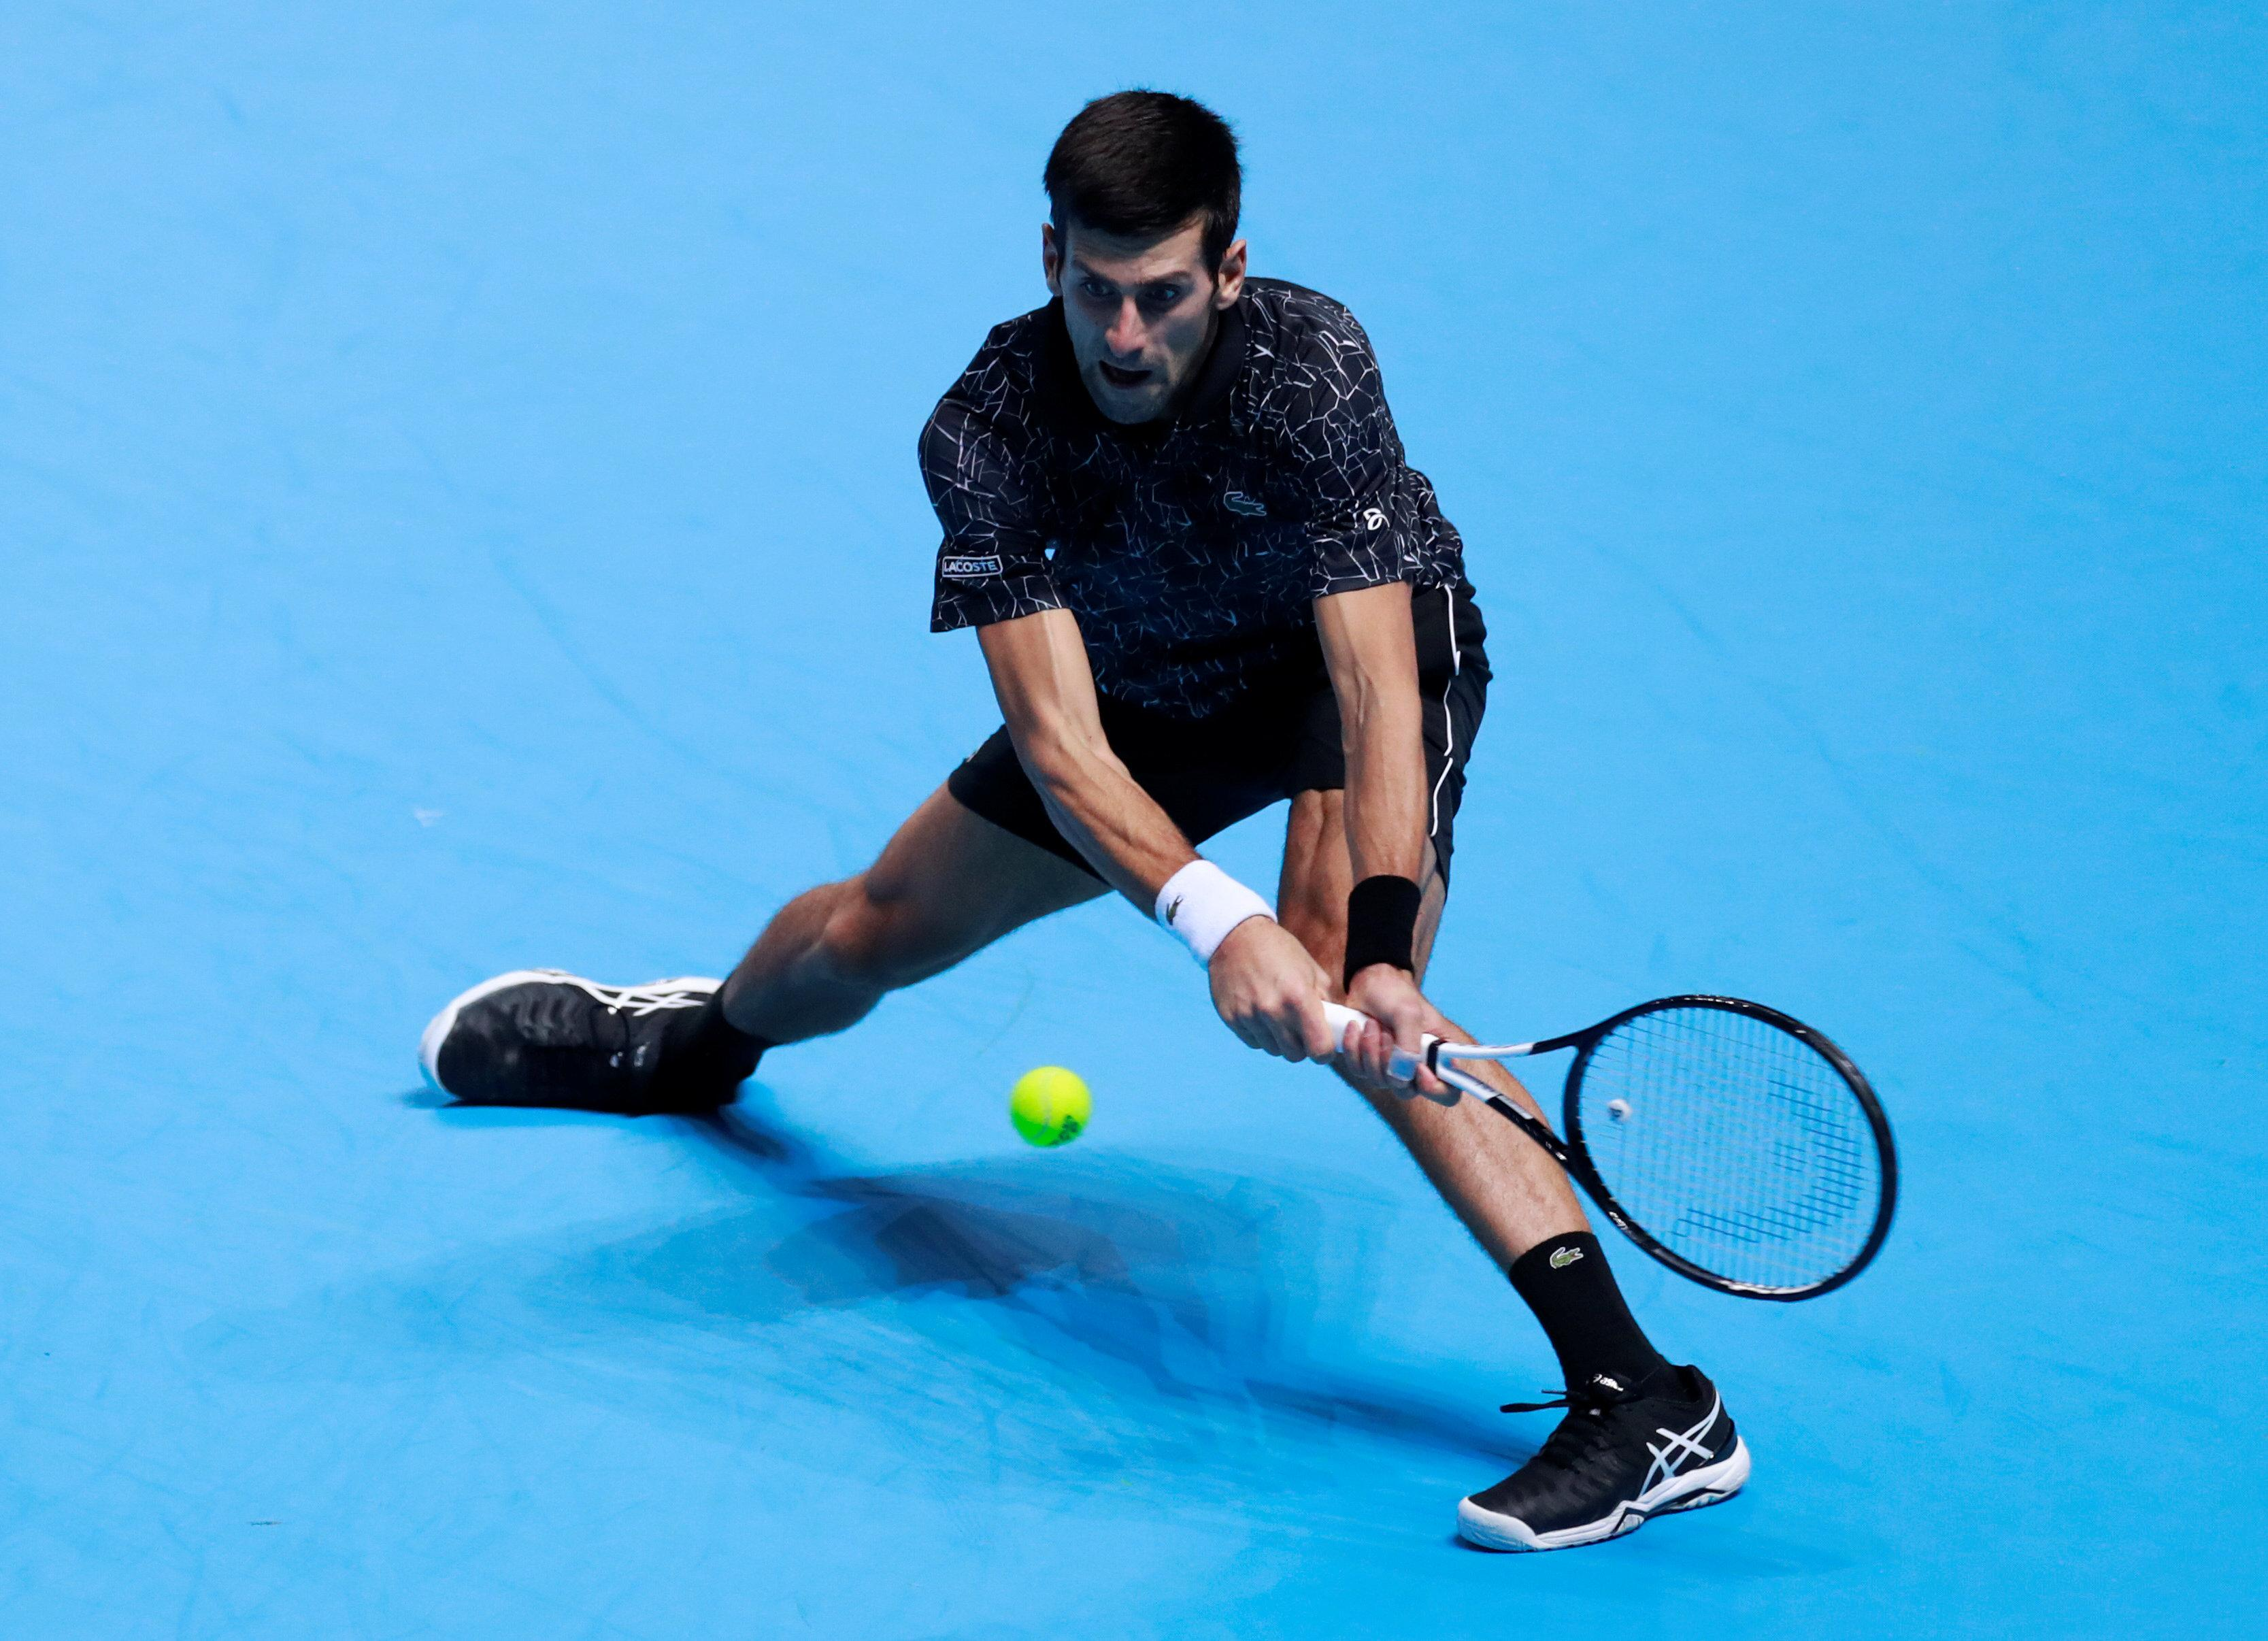 Novak Djokovic was nicknamed Mr Bendy because of his signature elasticity